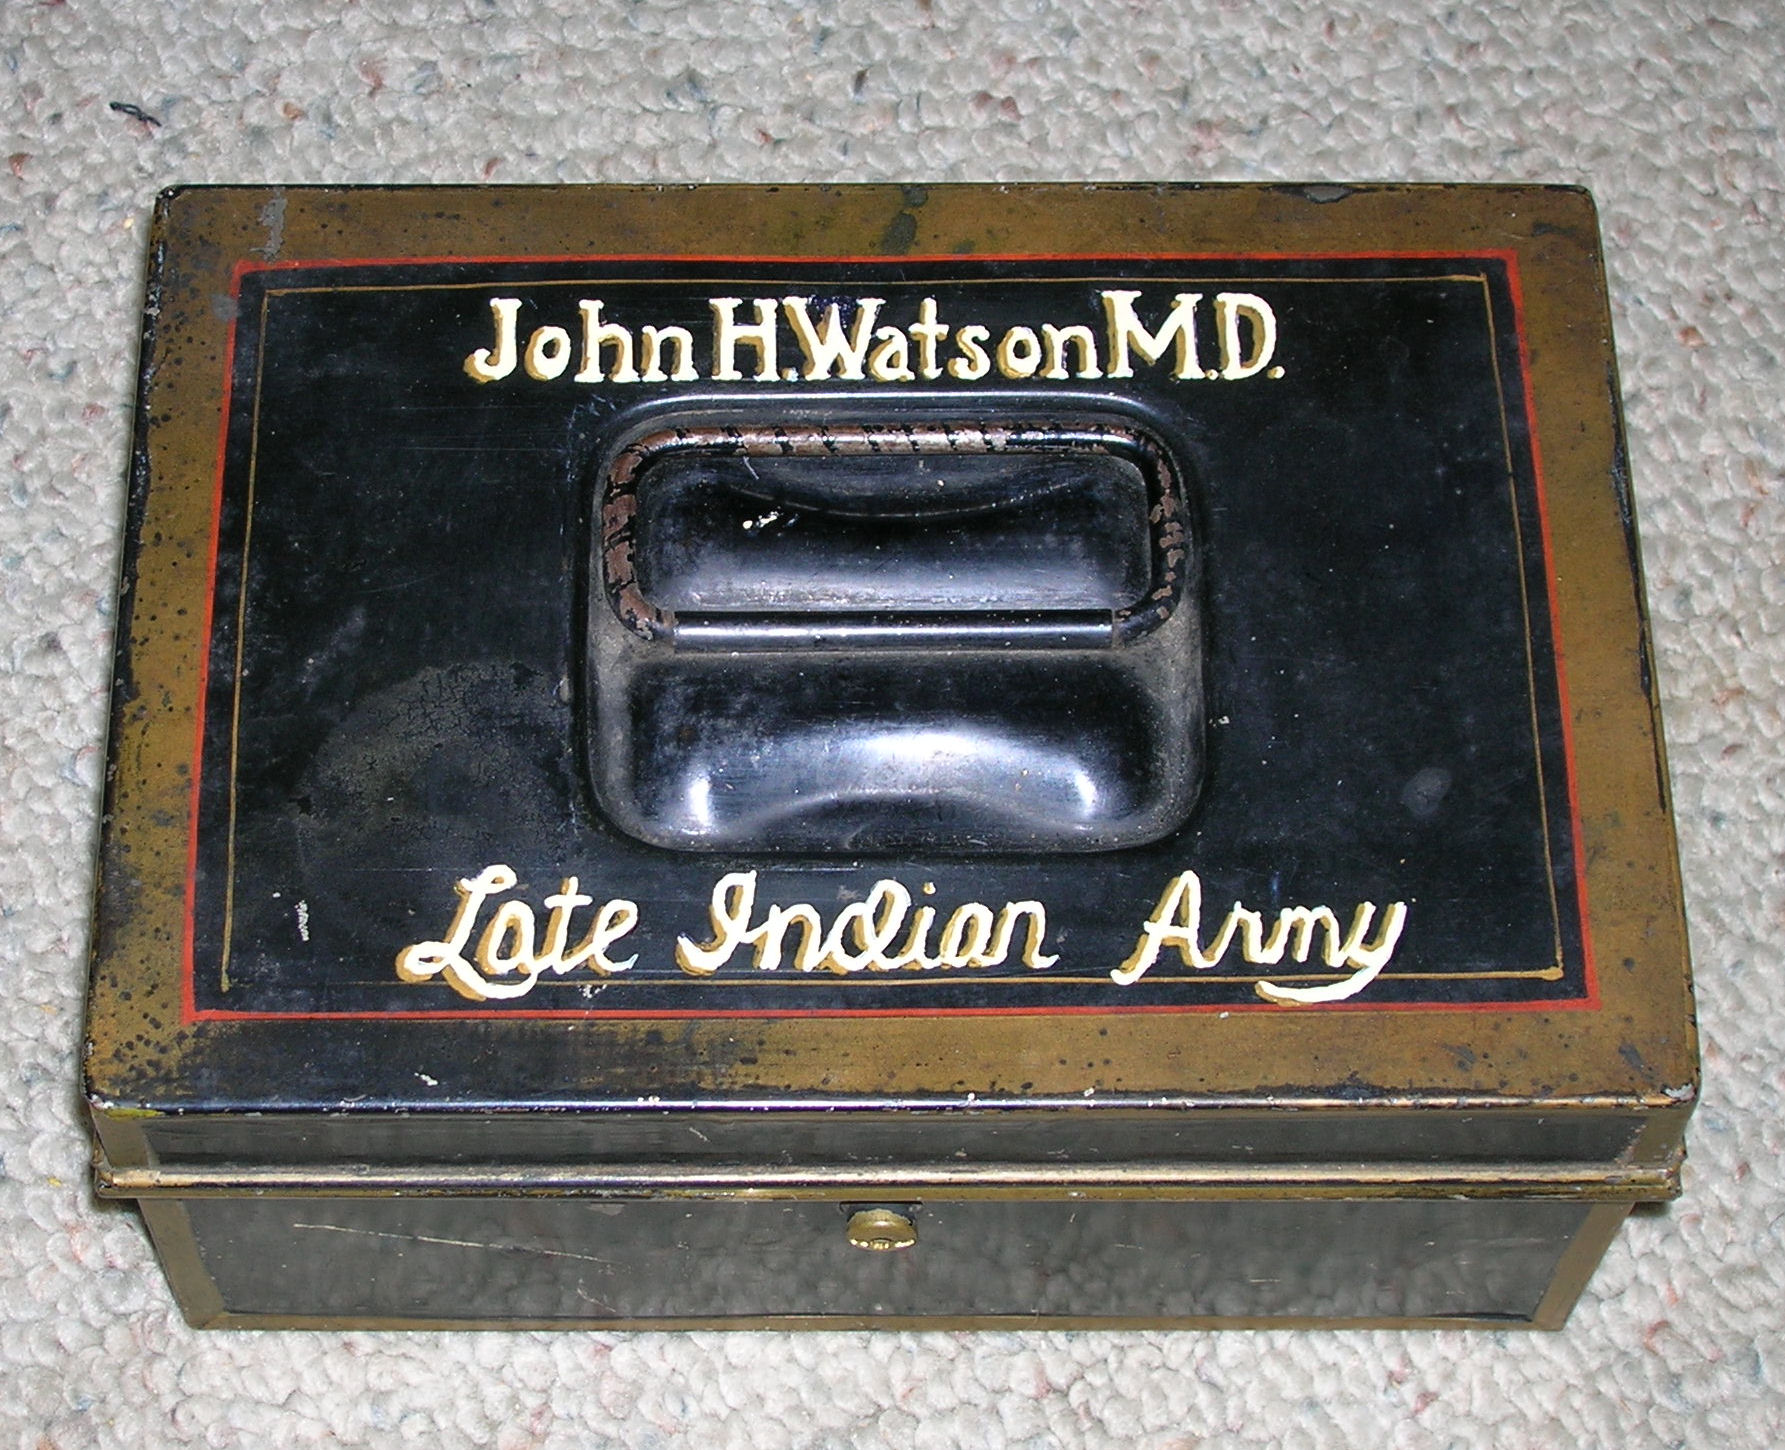 From Watson's Tin Box: The Three Garridebs